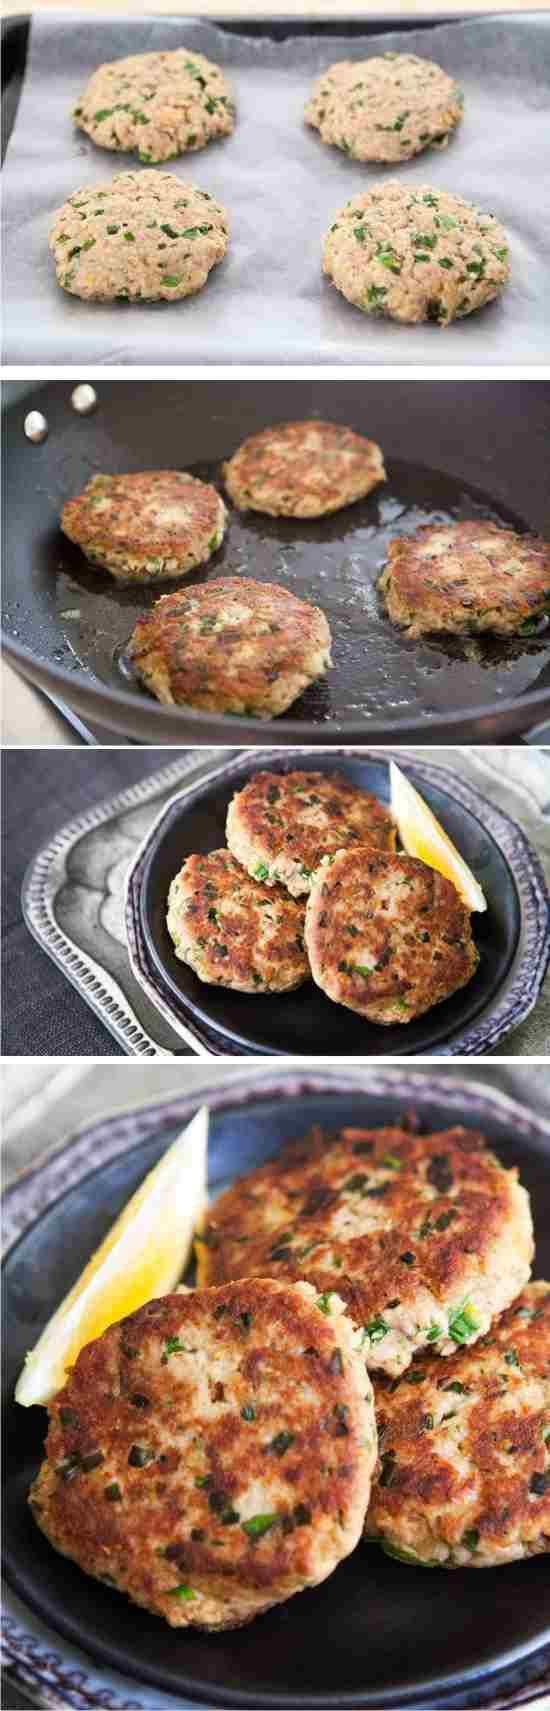 Tuna Patties - black pepper, bread, butter, green onion, healthy, hot, lemon, mustard, parsley, patties, pepper, recipes, sauce, tobasco, tuna